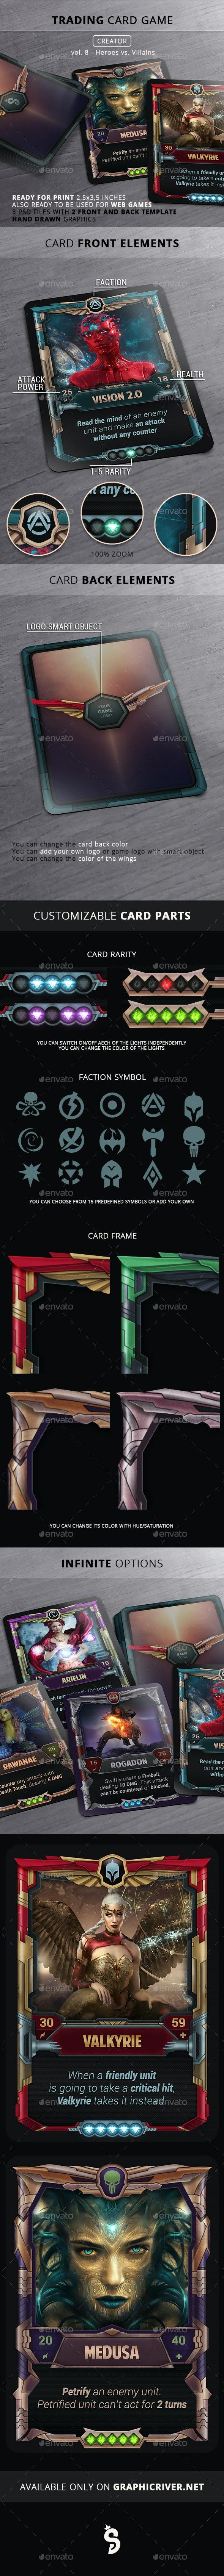 TCG Creator - Vol 8 - Heroes VS Villains - Miscellaneous Game Assets